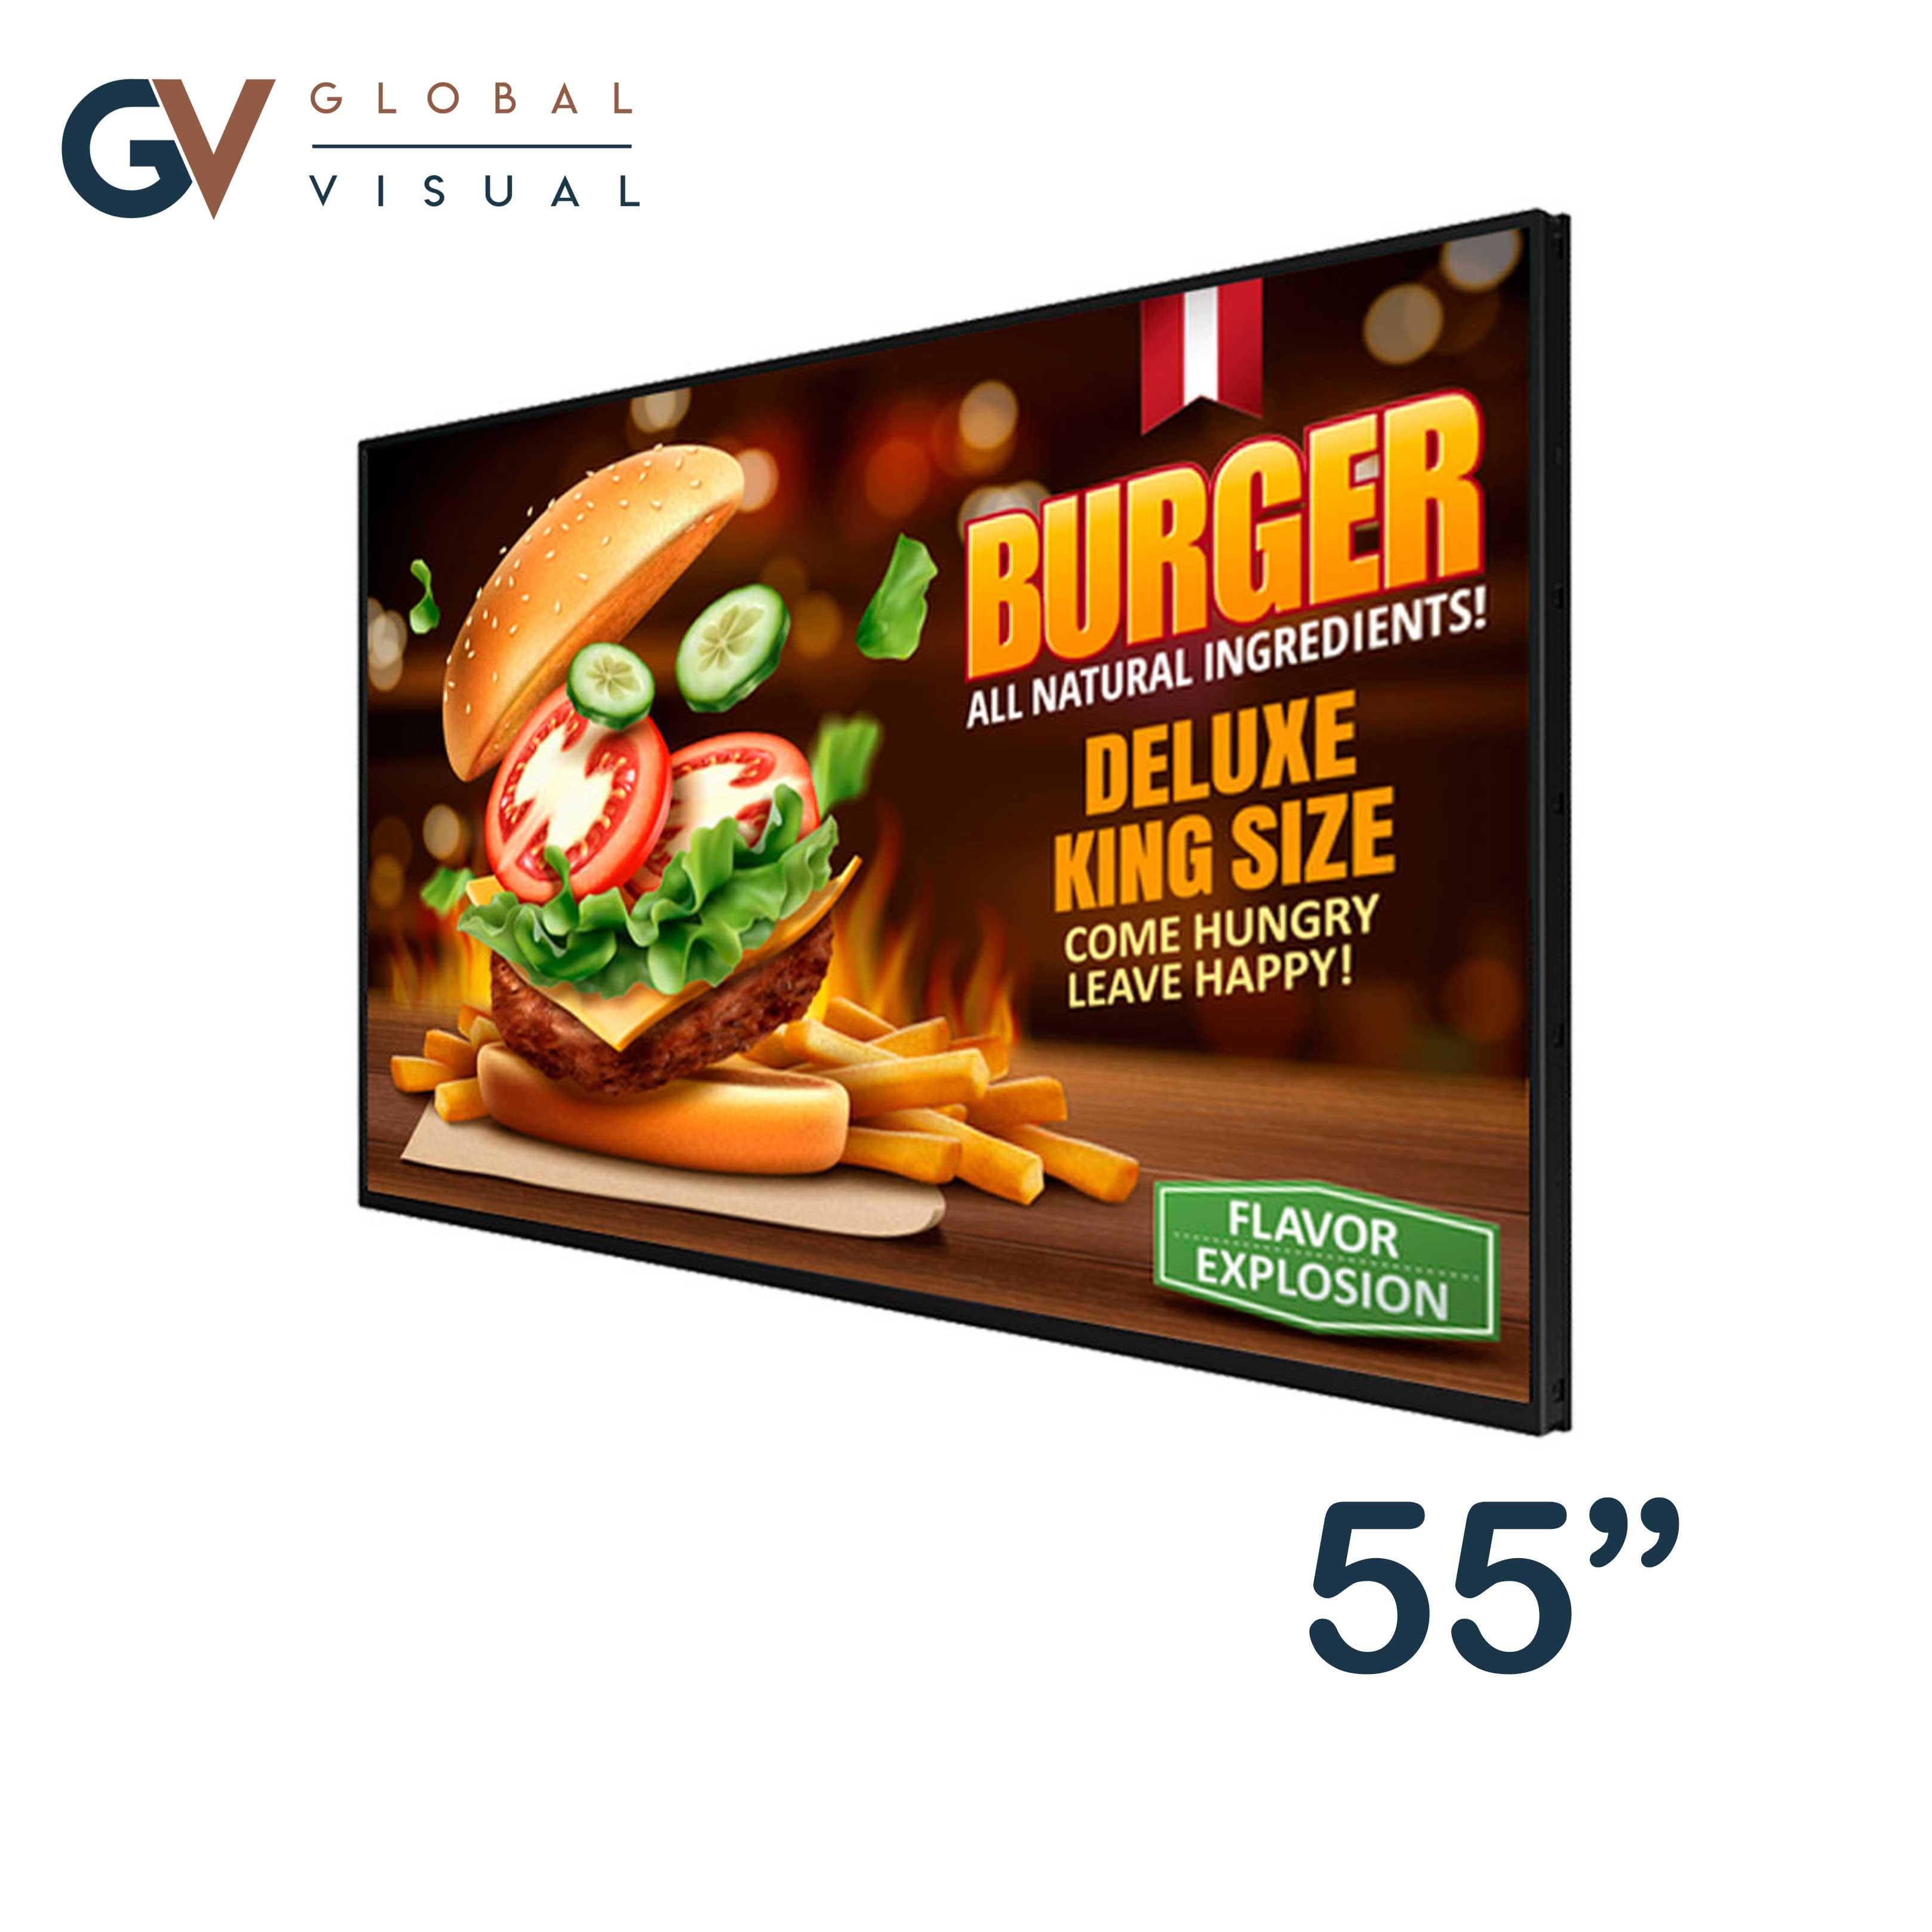 "Image of a 55"" digital menu board"